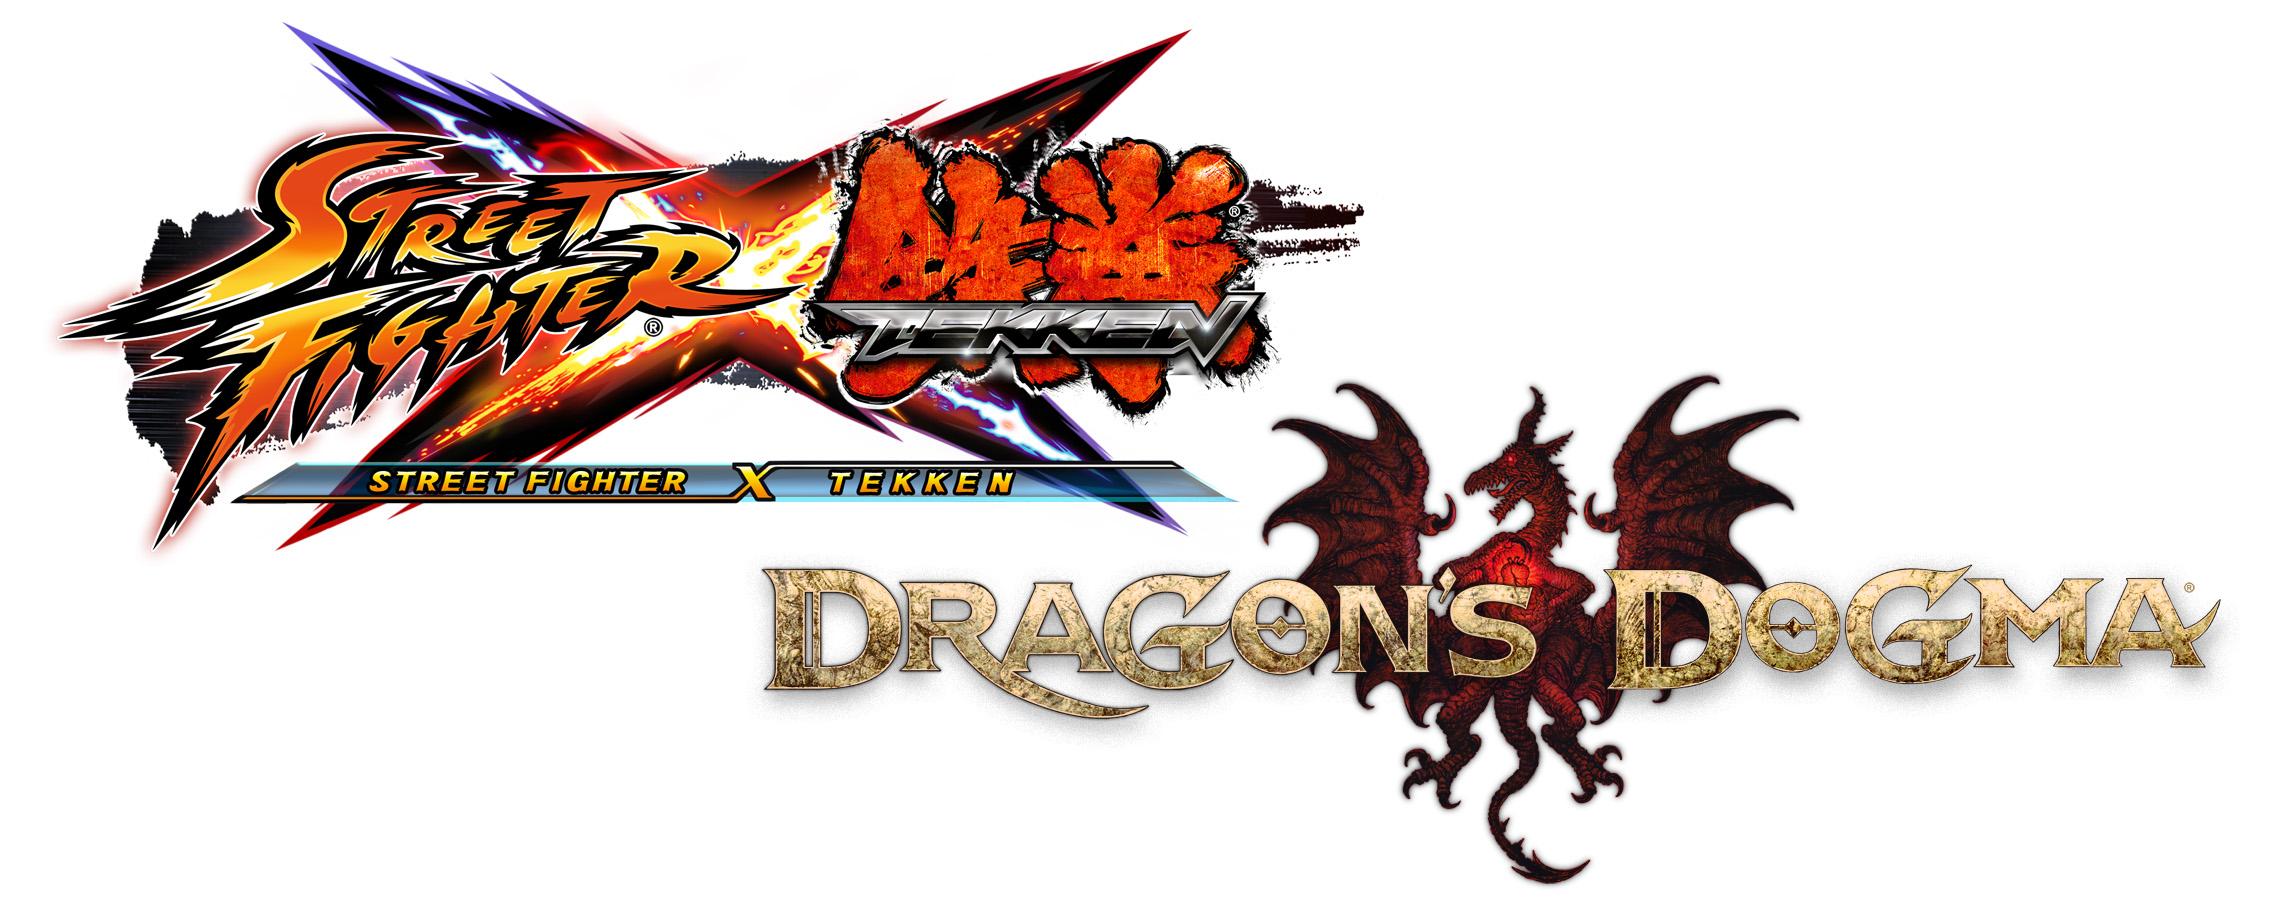 street vs tekken Dragons Dogma